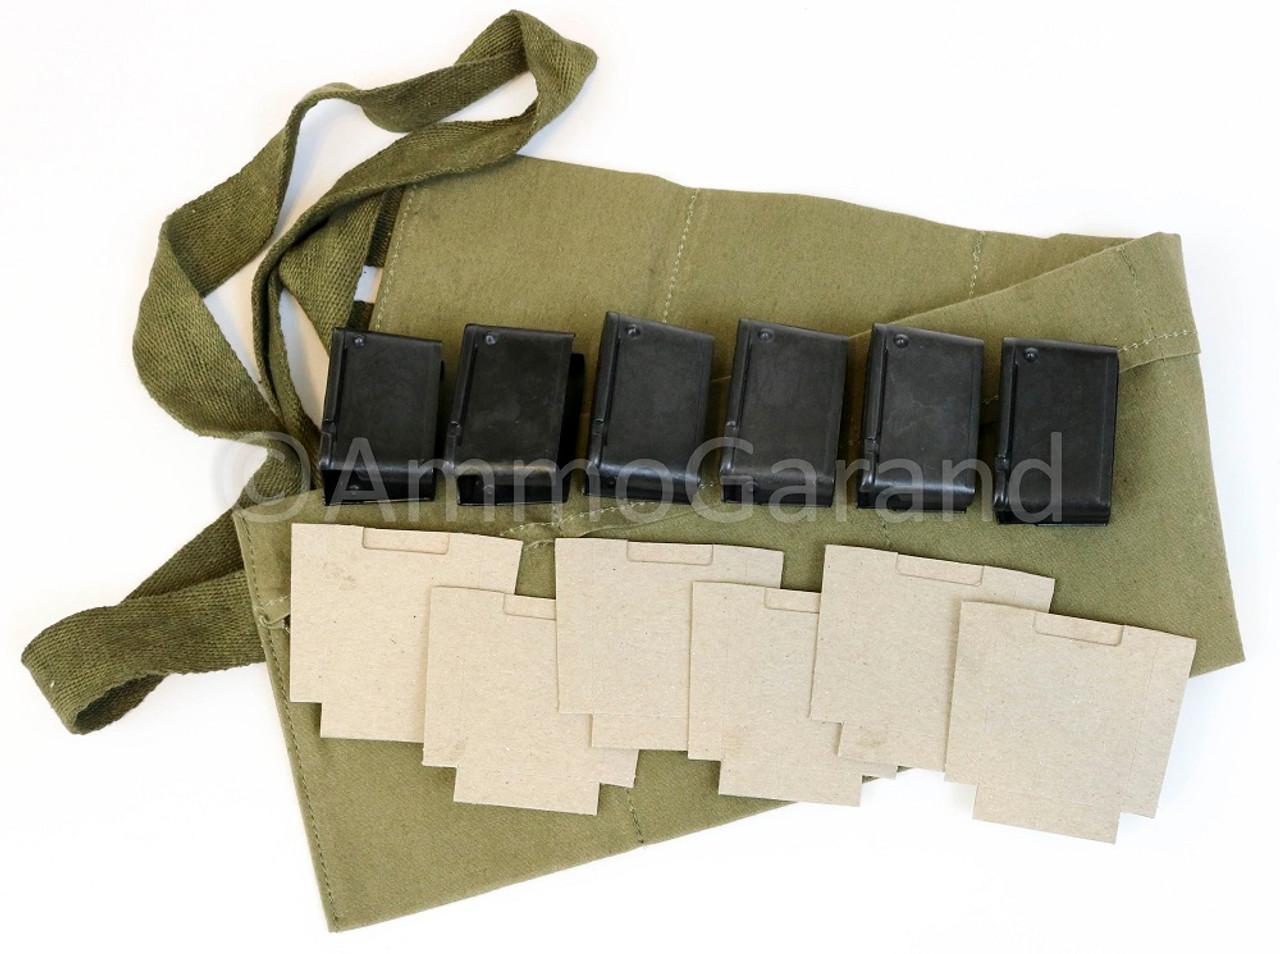 M1 Garand Repack Set w/ 8rd Clips Cardboard Inserts and Six Pocket Bandoleer